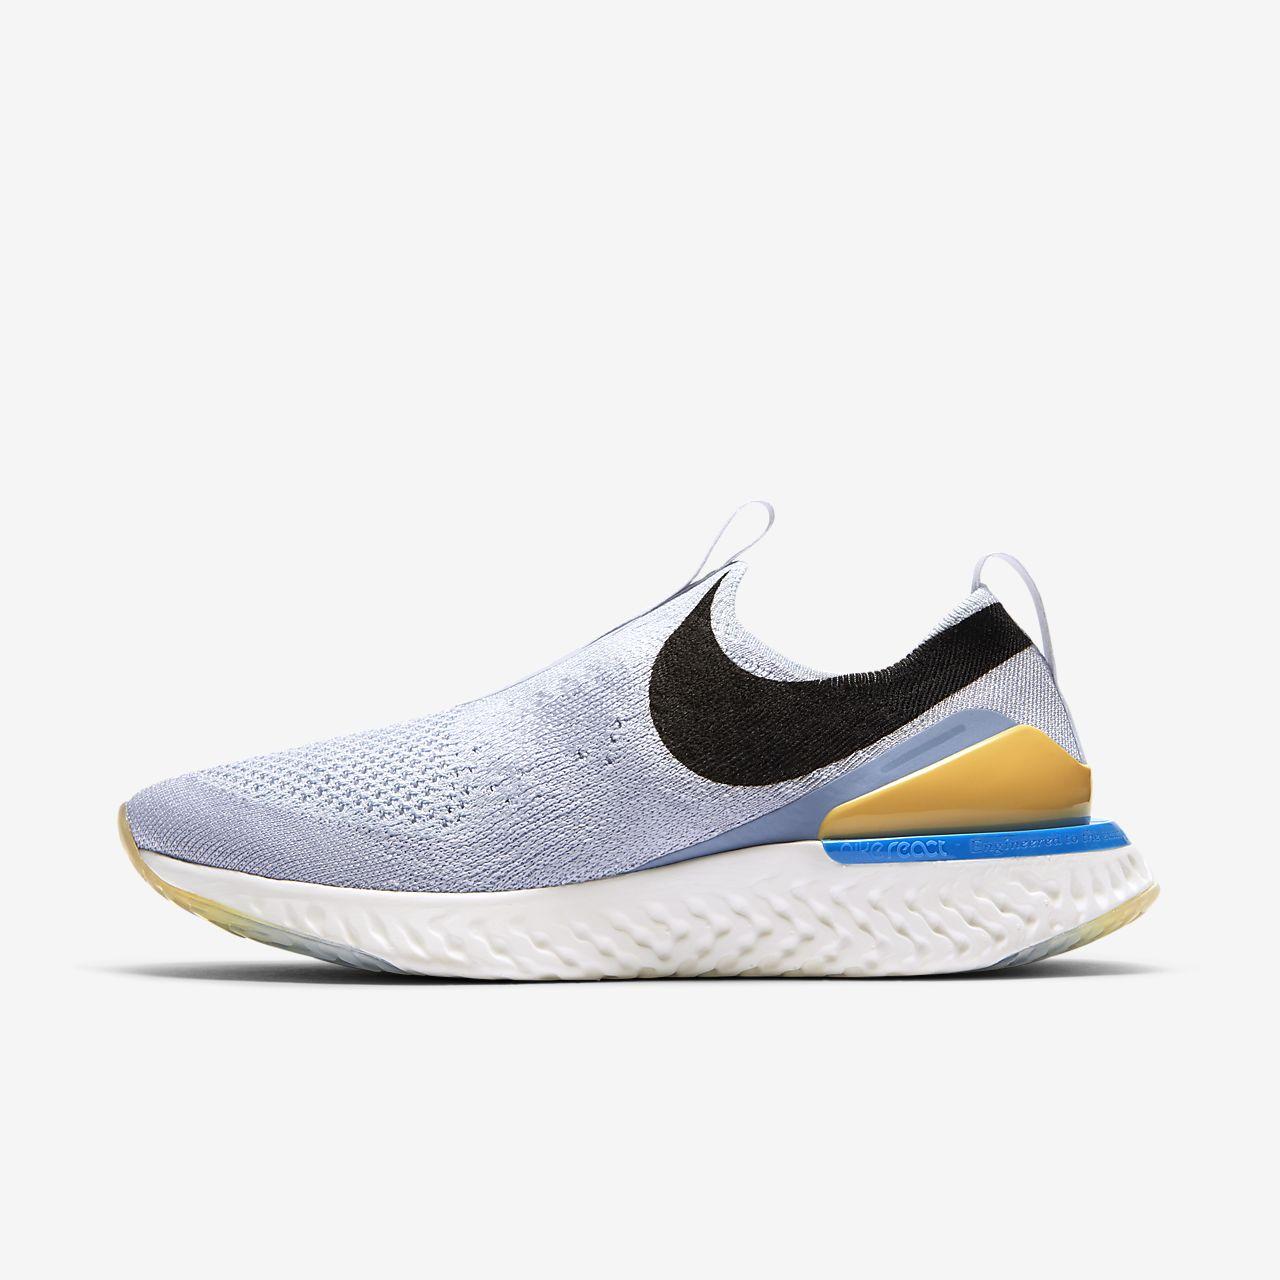 Nike Epic Phantom React Zapatillas de running - Mujer